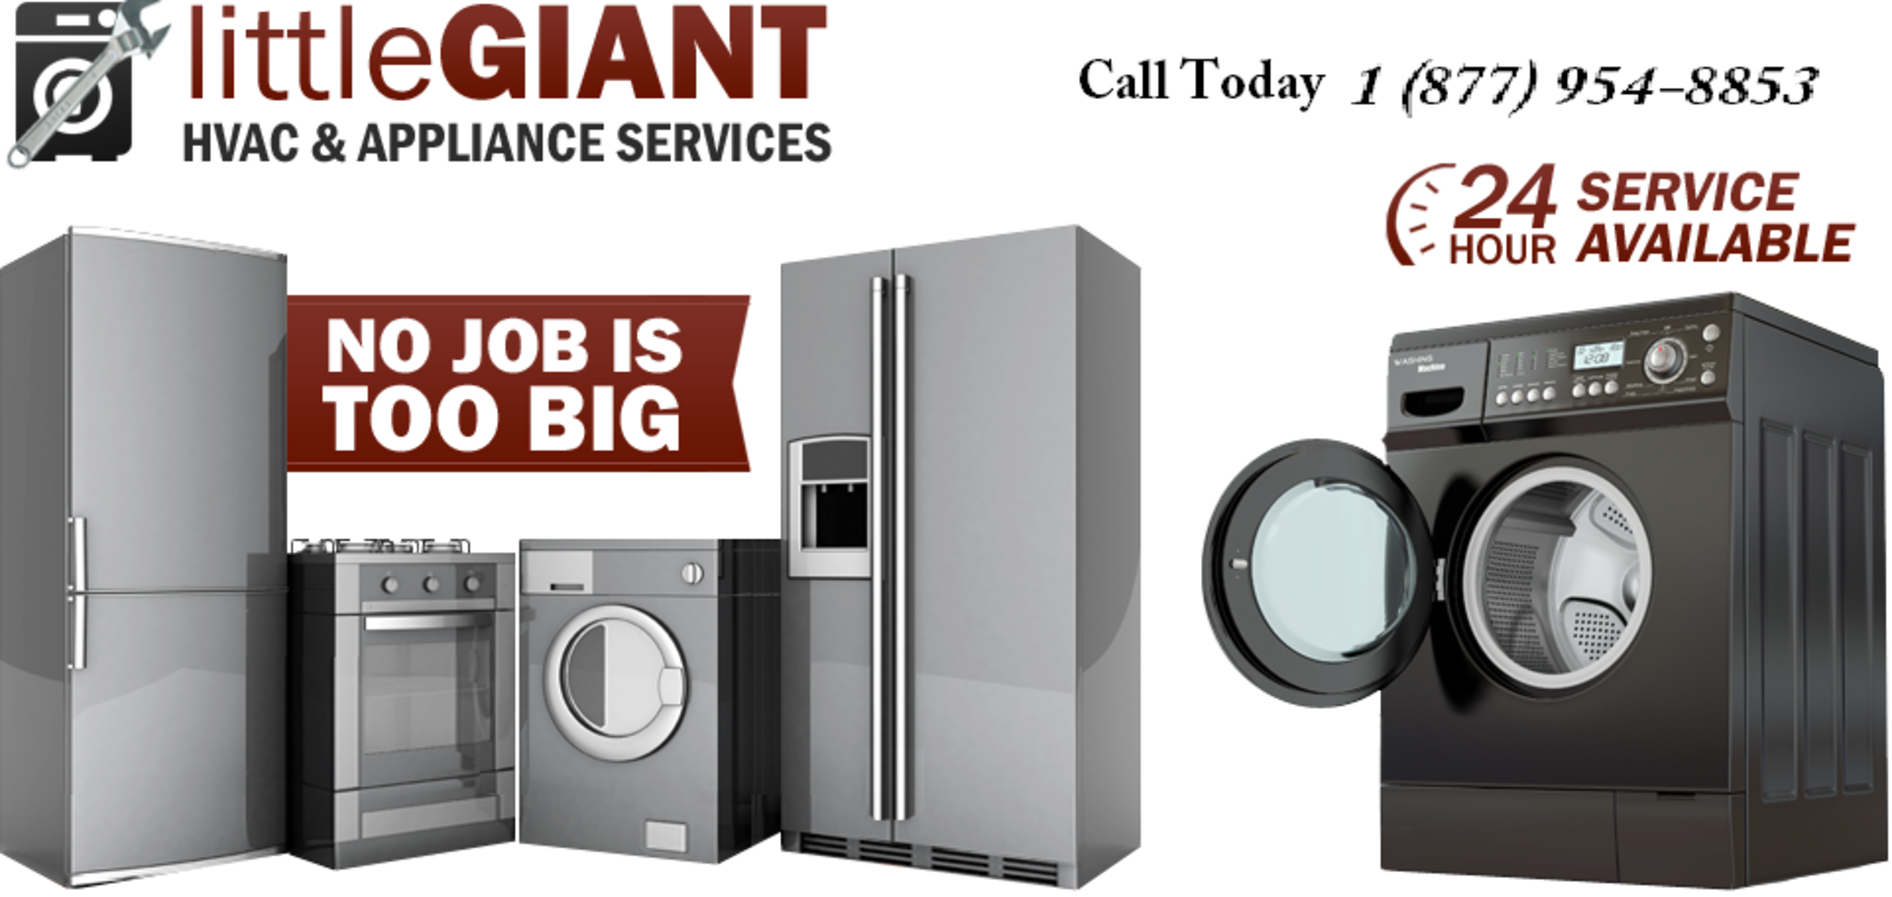 Home Appliance Service Appliance Repair Hvac Repair Refrigerator Repair Dryer Repair